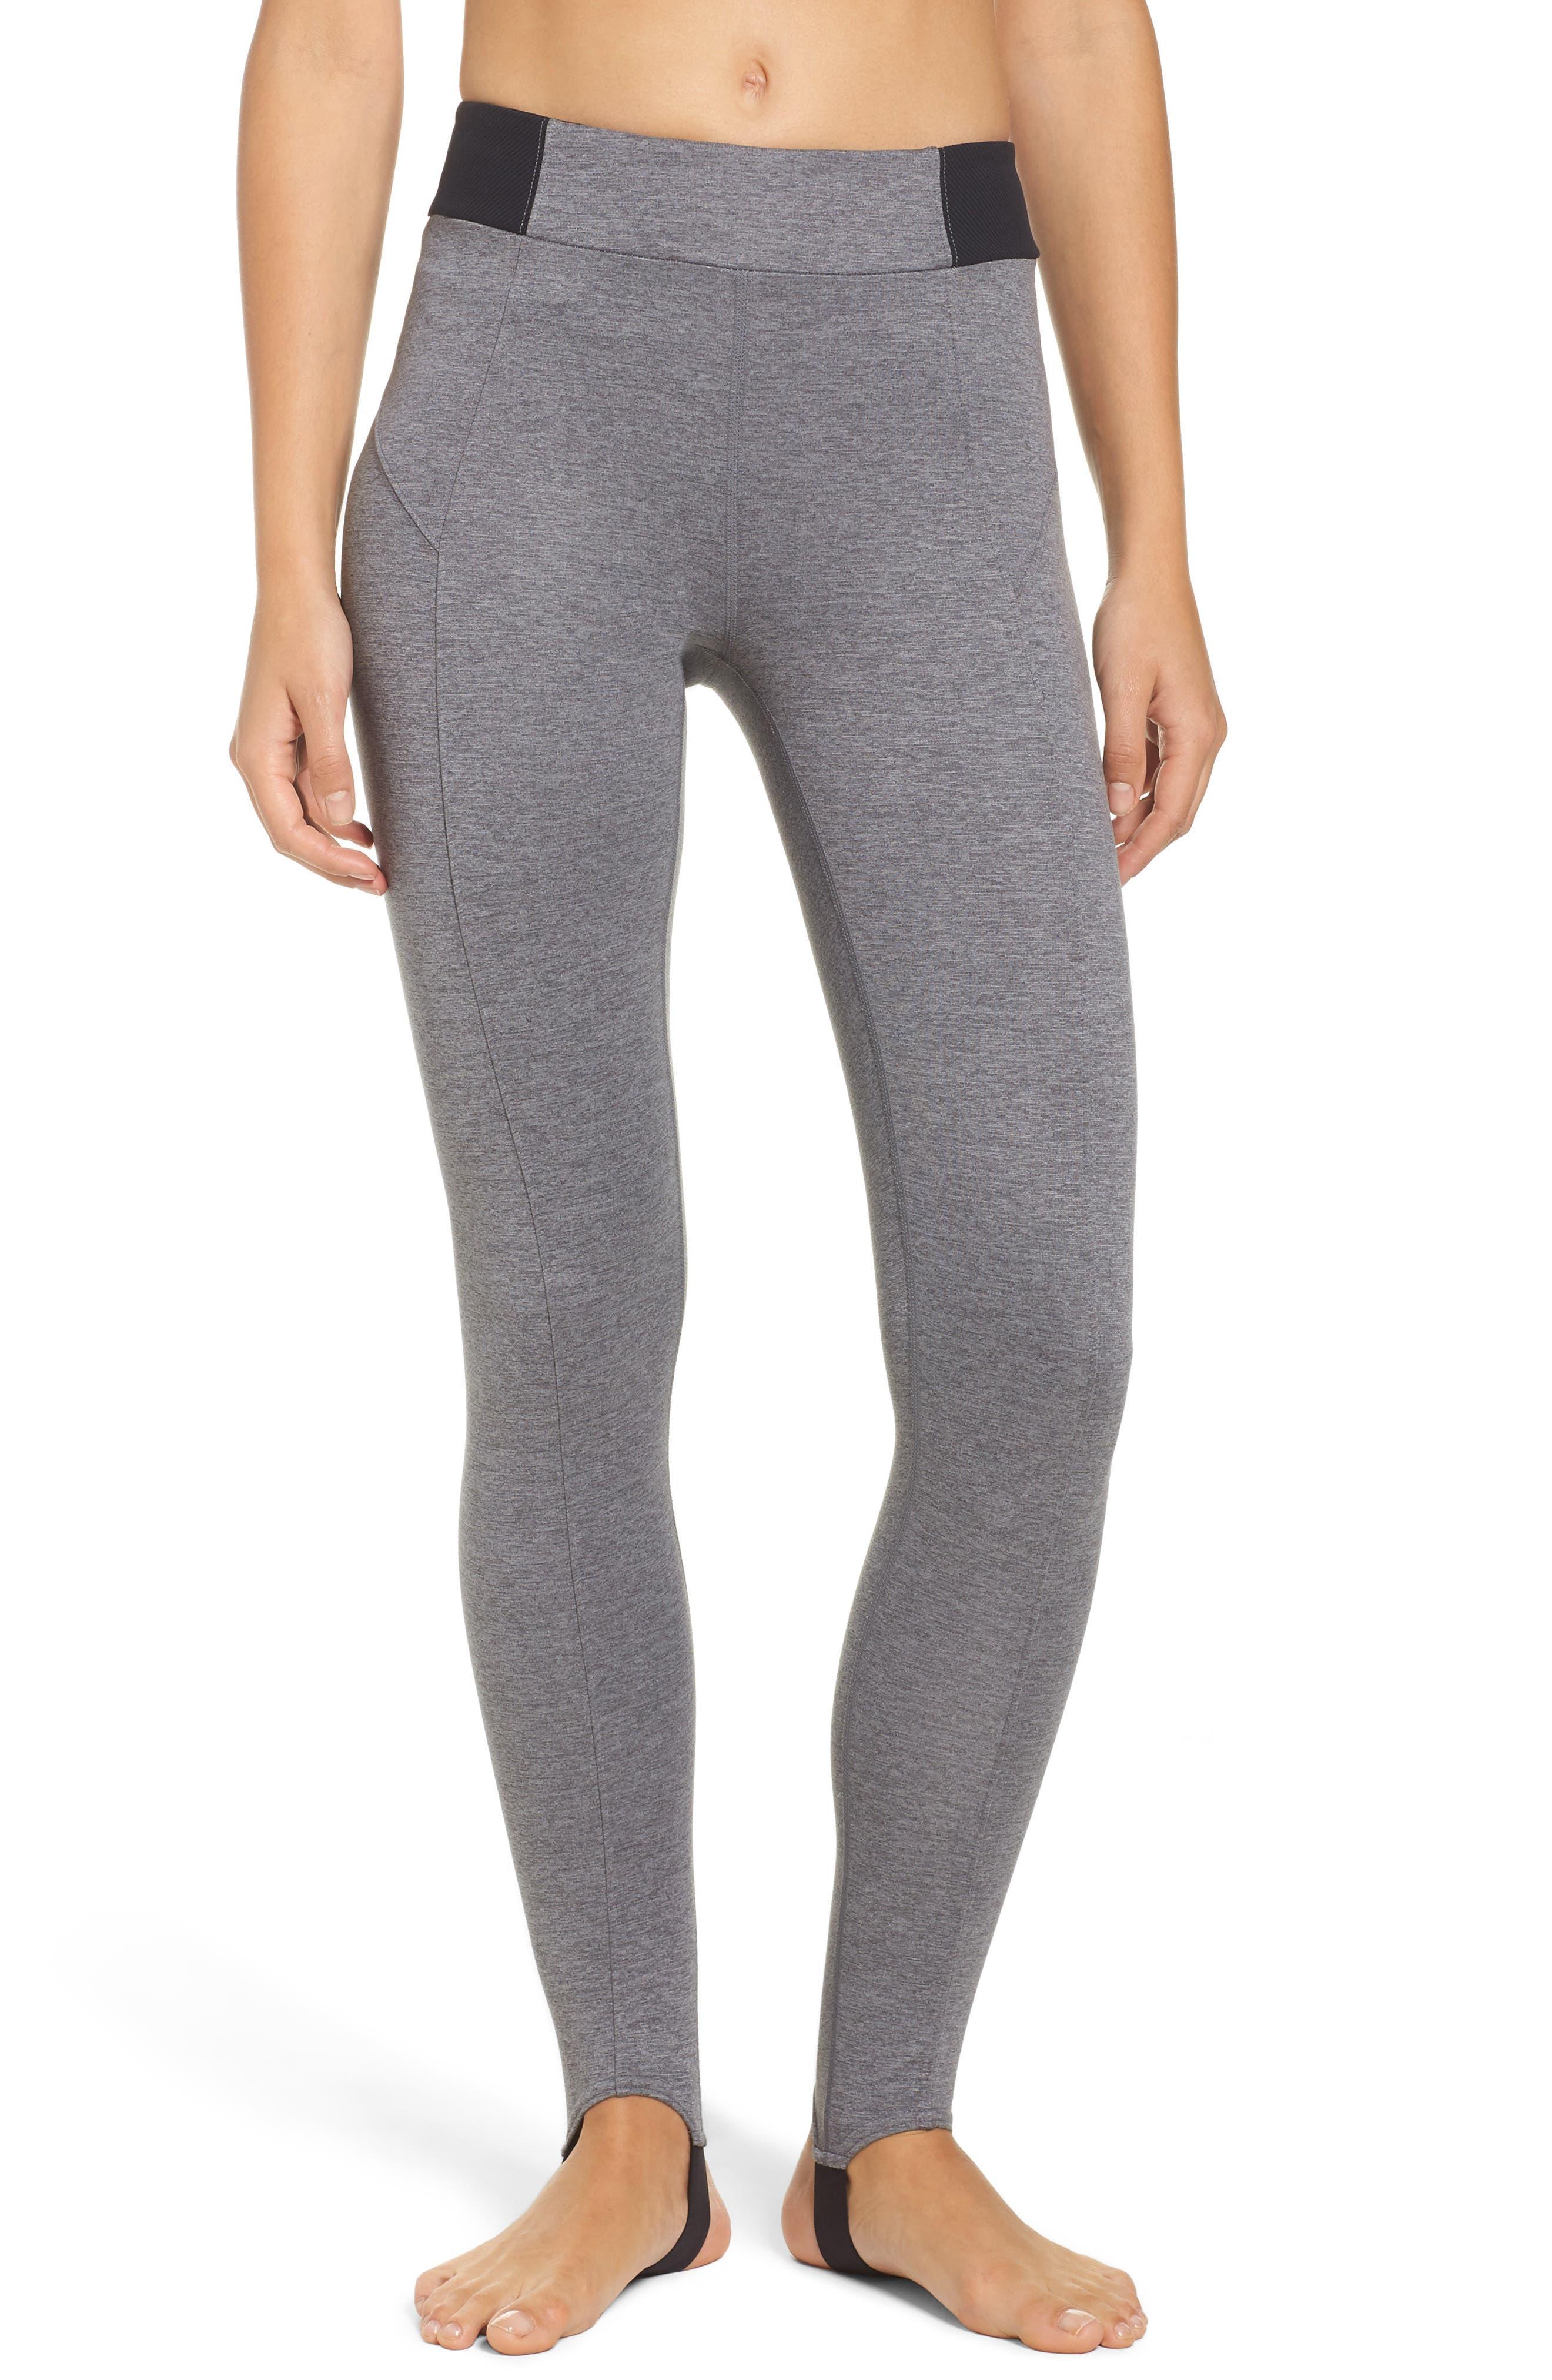 Turn Heads High Waist Stirrup Leggings,                         Main,                         color, Grey Dark Heather